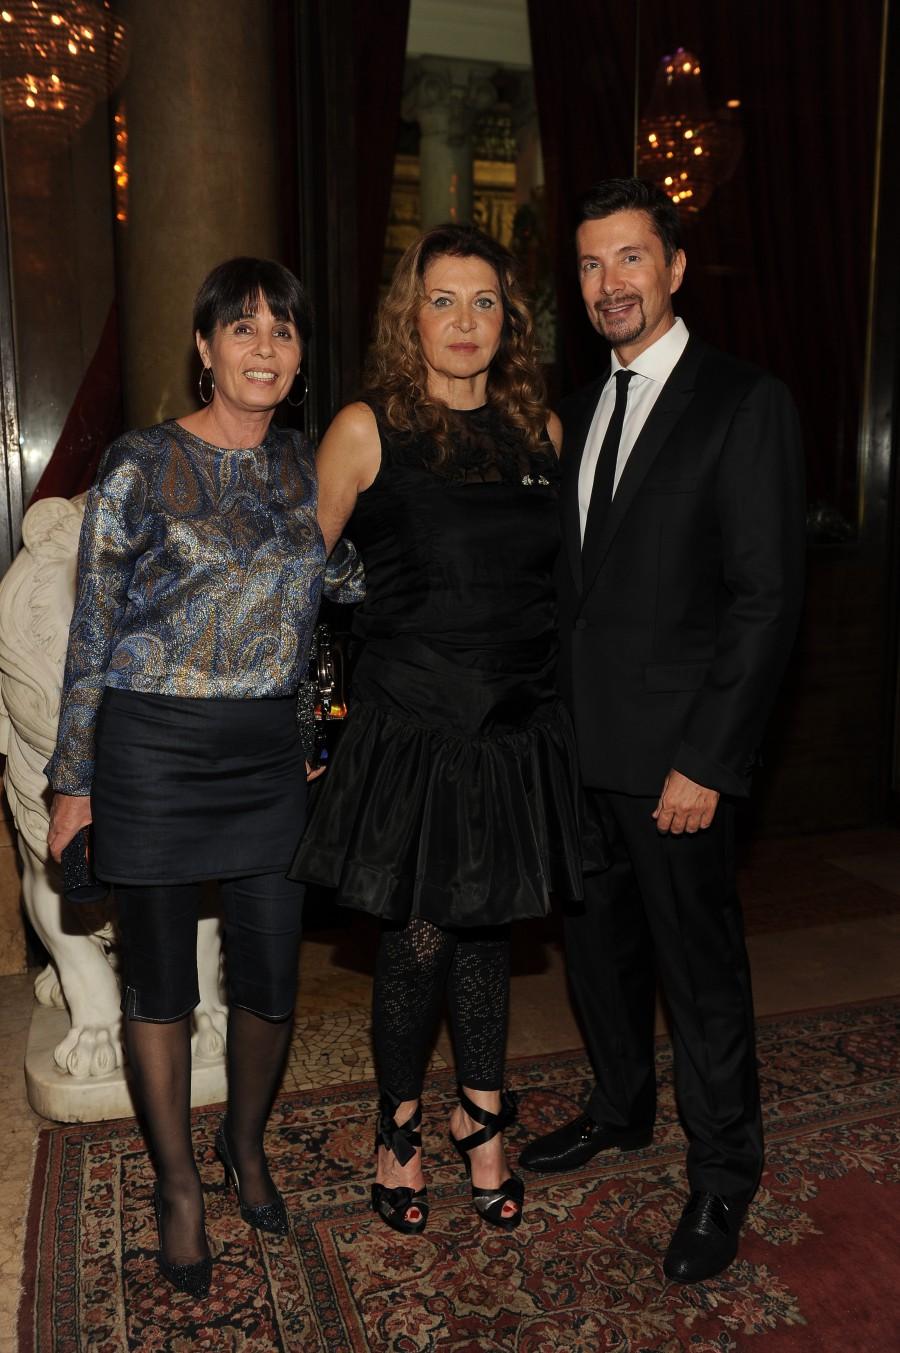 Sandra Vezza - Maria Luisa Trussardi - Riccardo Signoretti